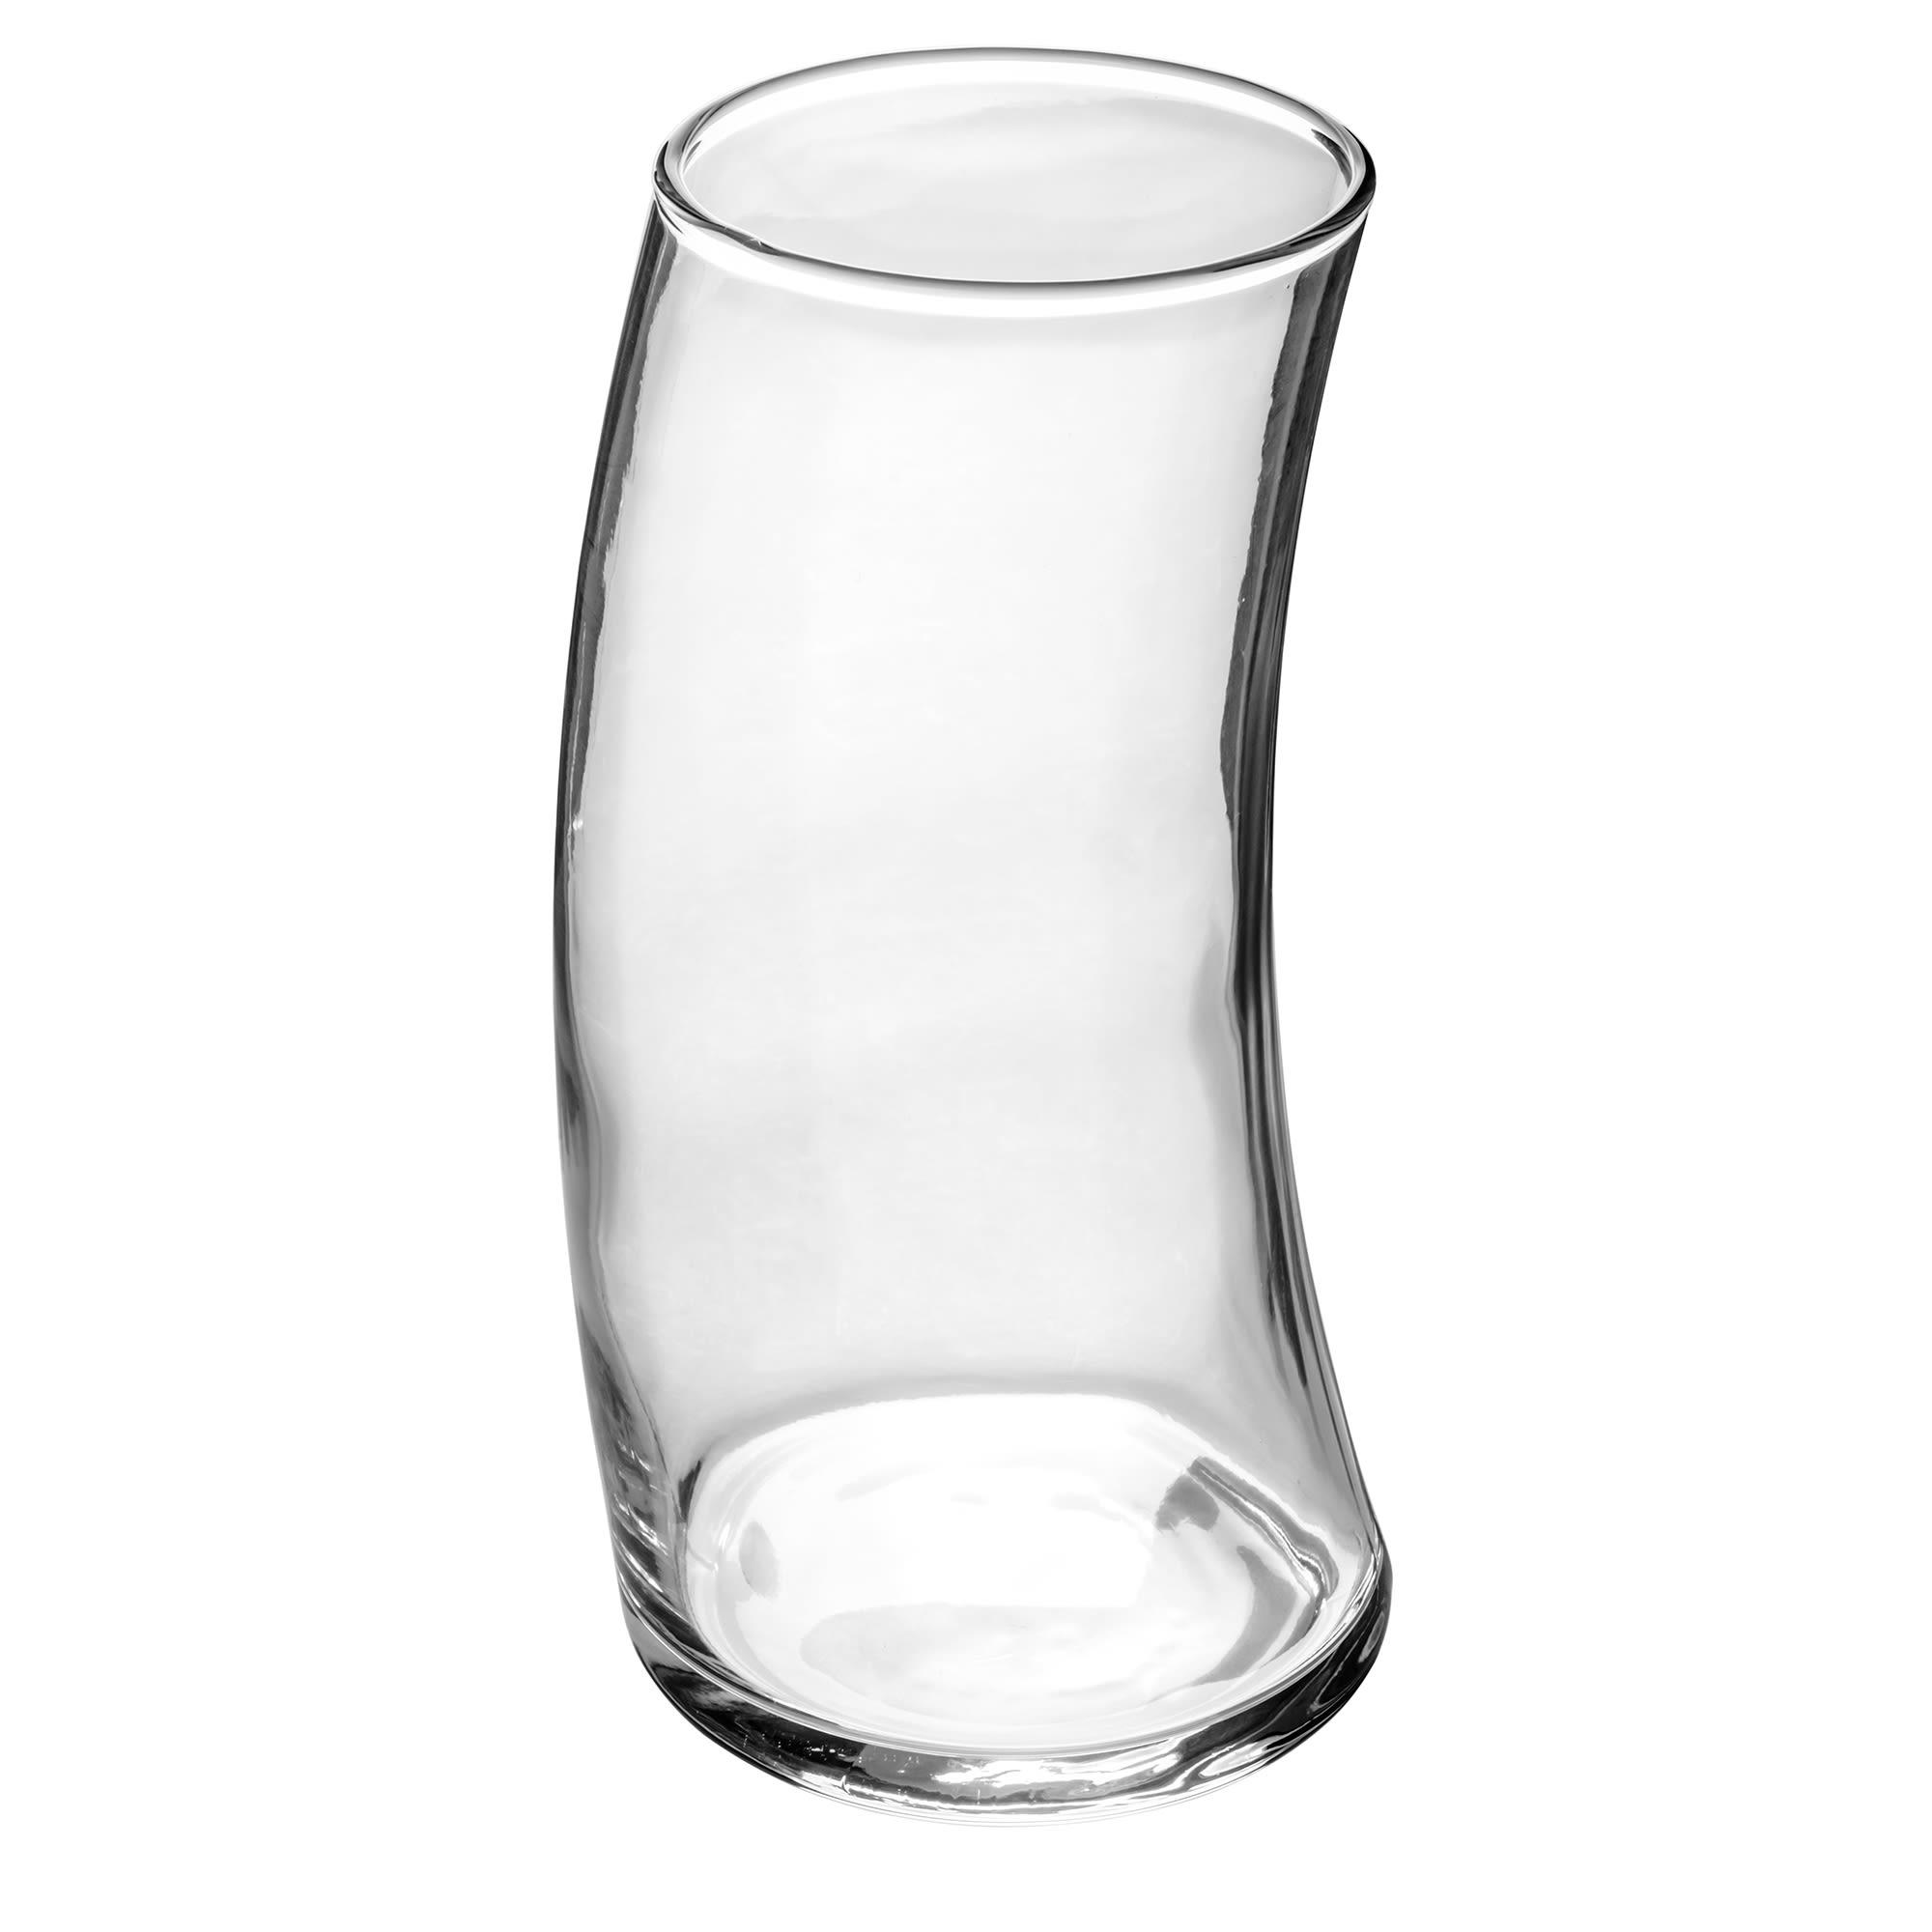 Libbey 2212 16.75-oz Bravura Cooler Glass